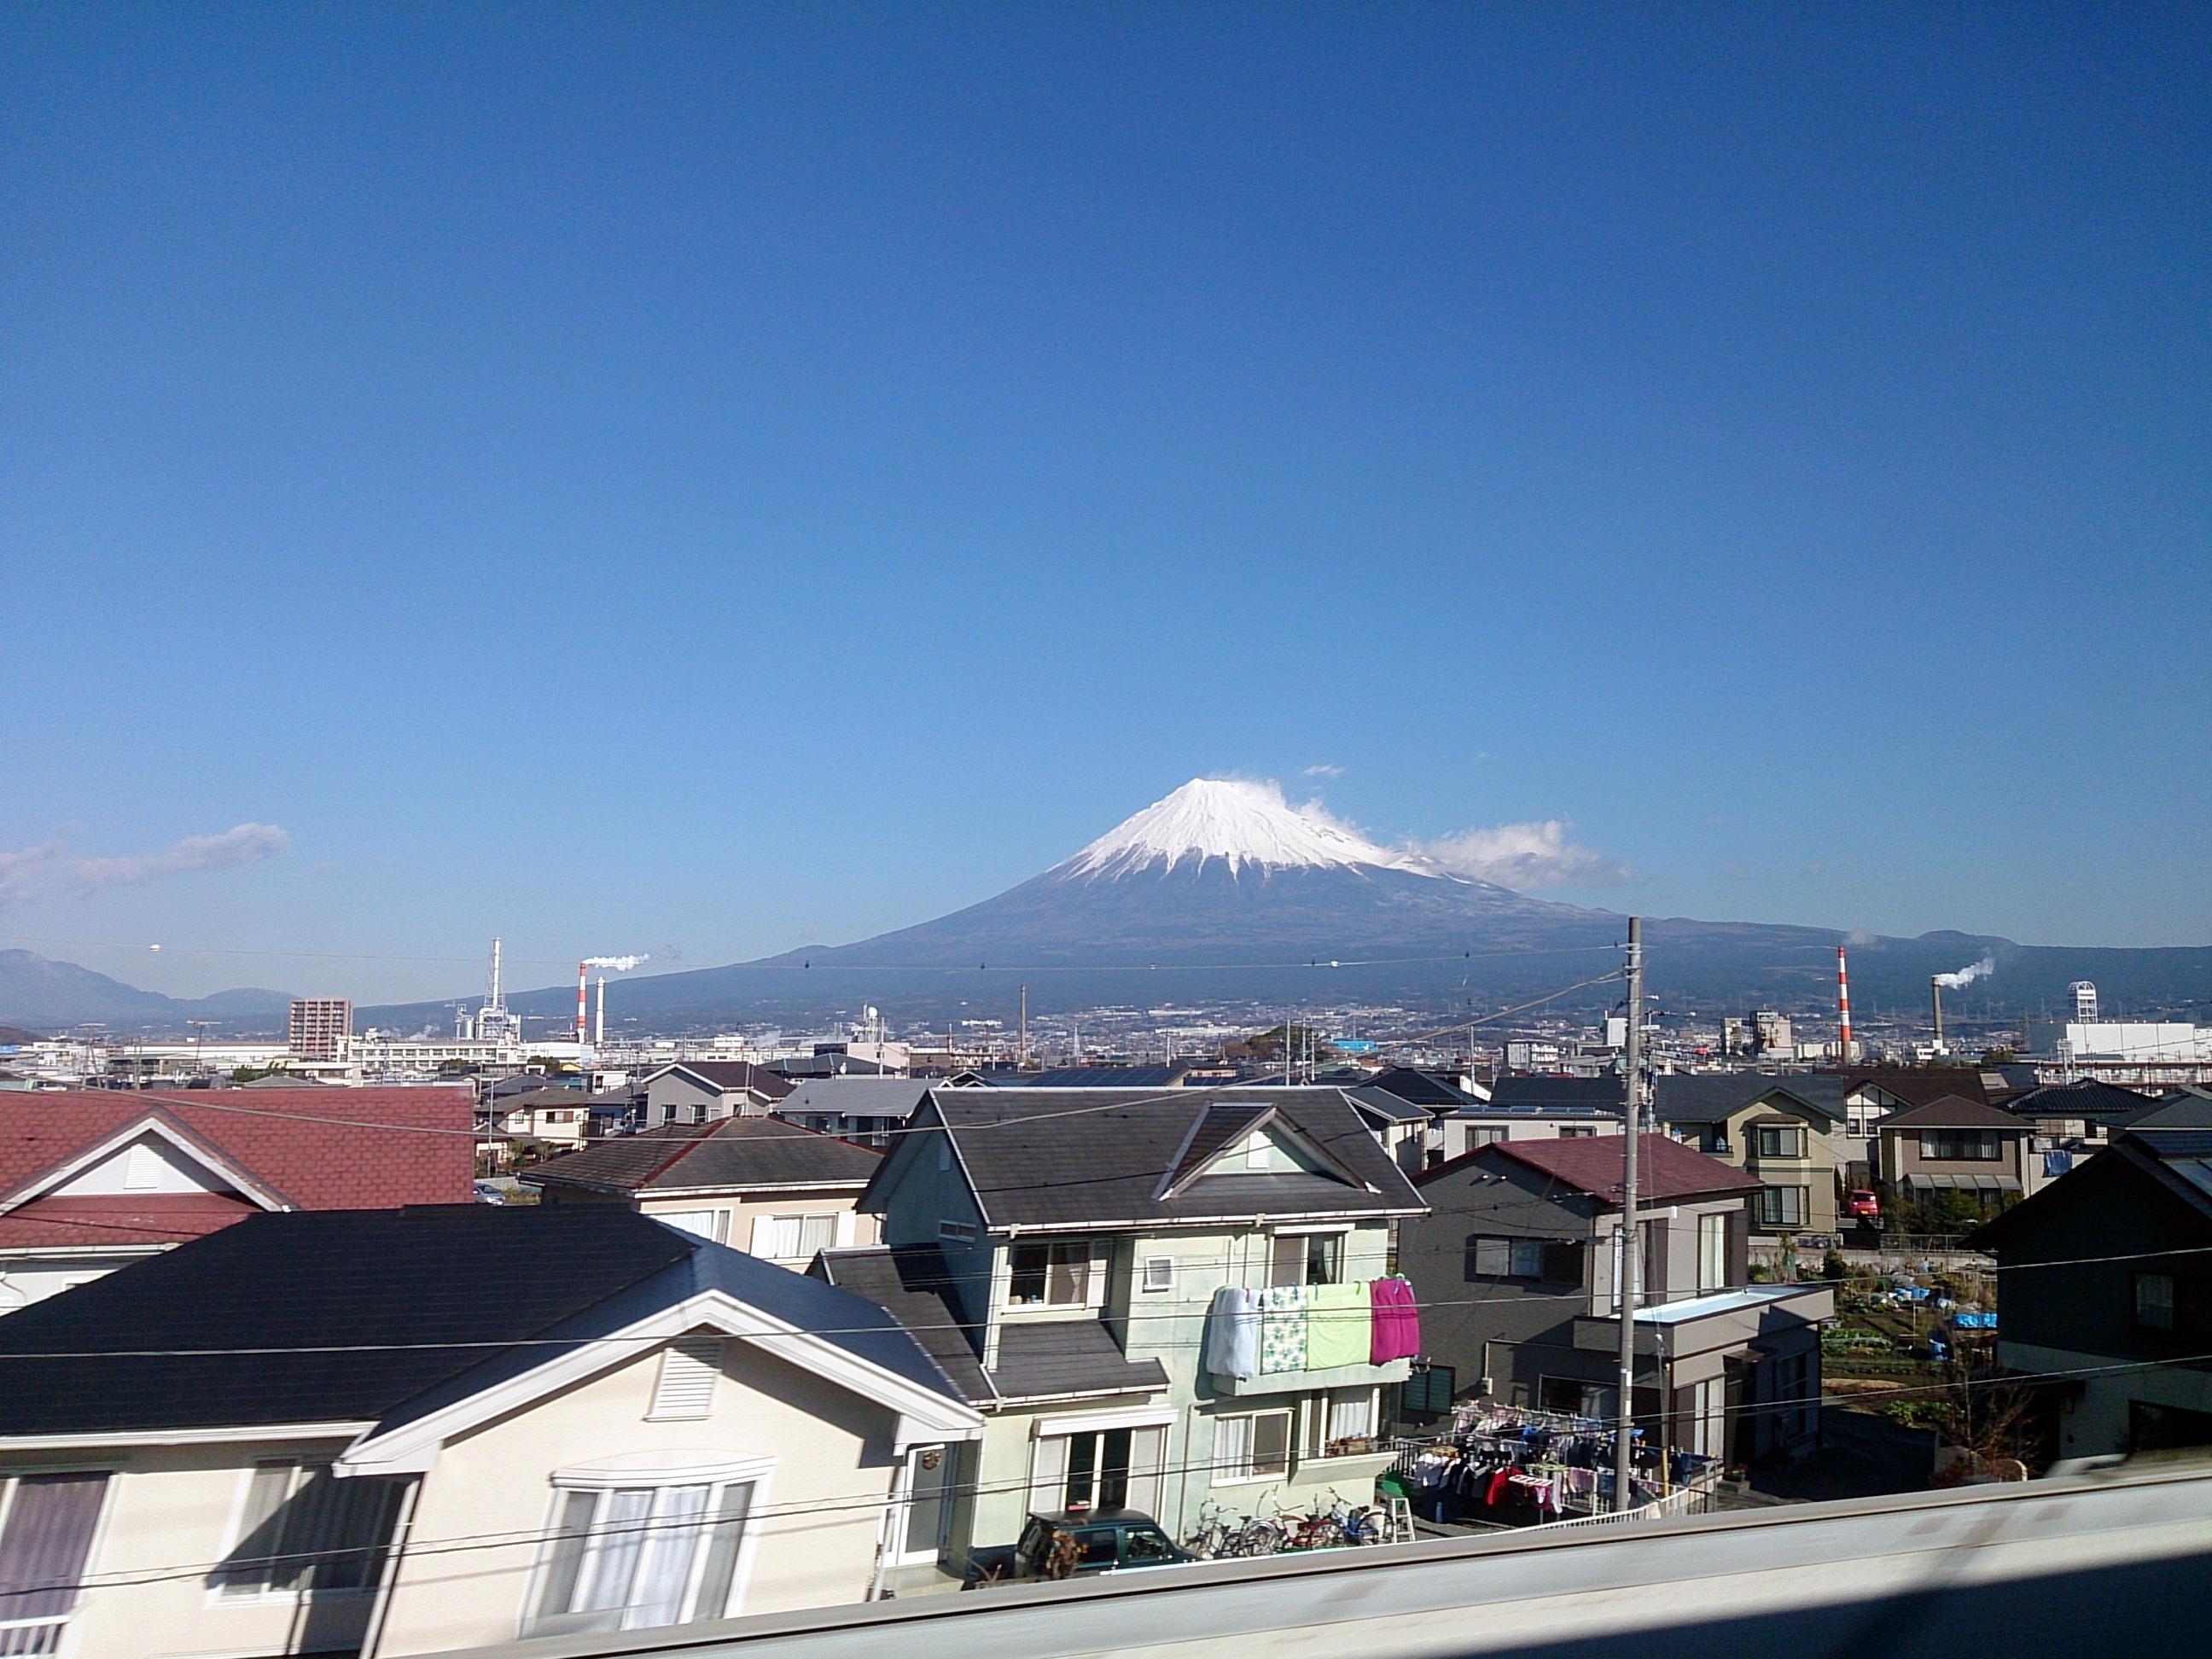 MtFuji_BoundForTokyo_20141213.jpg